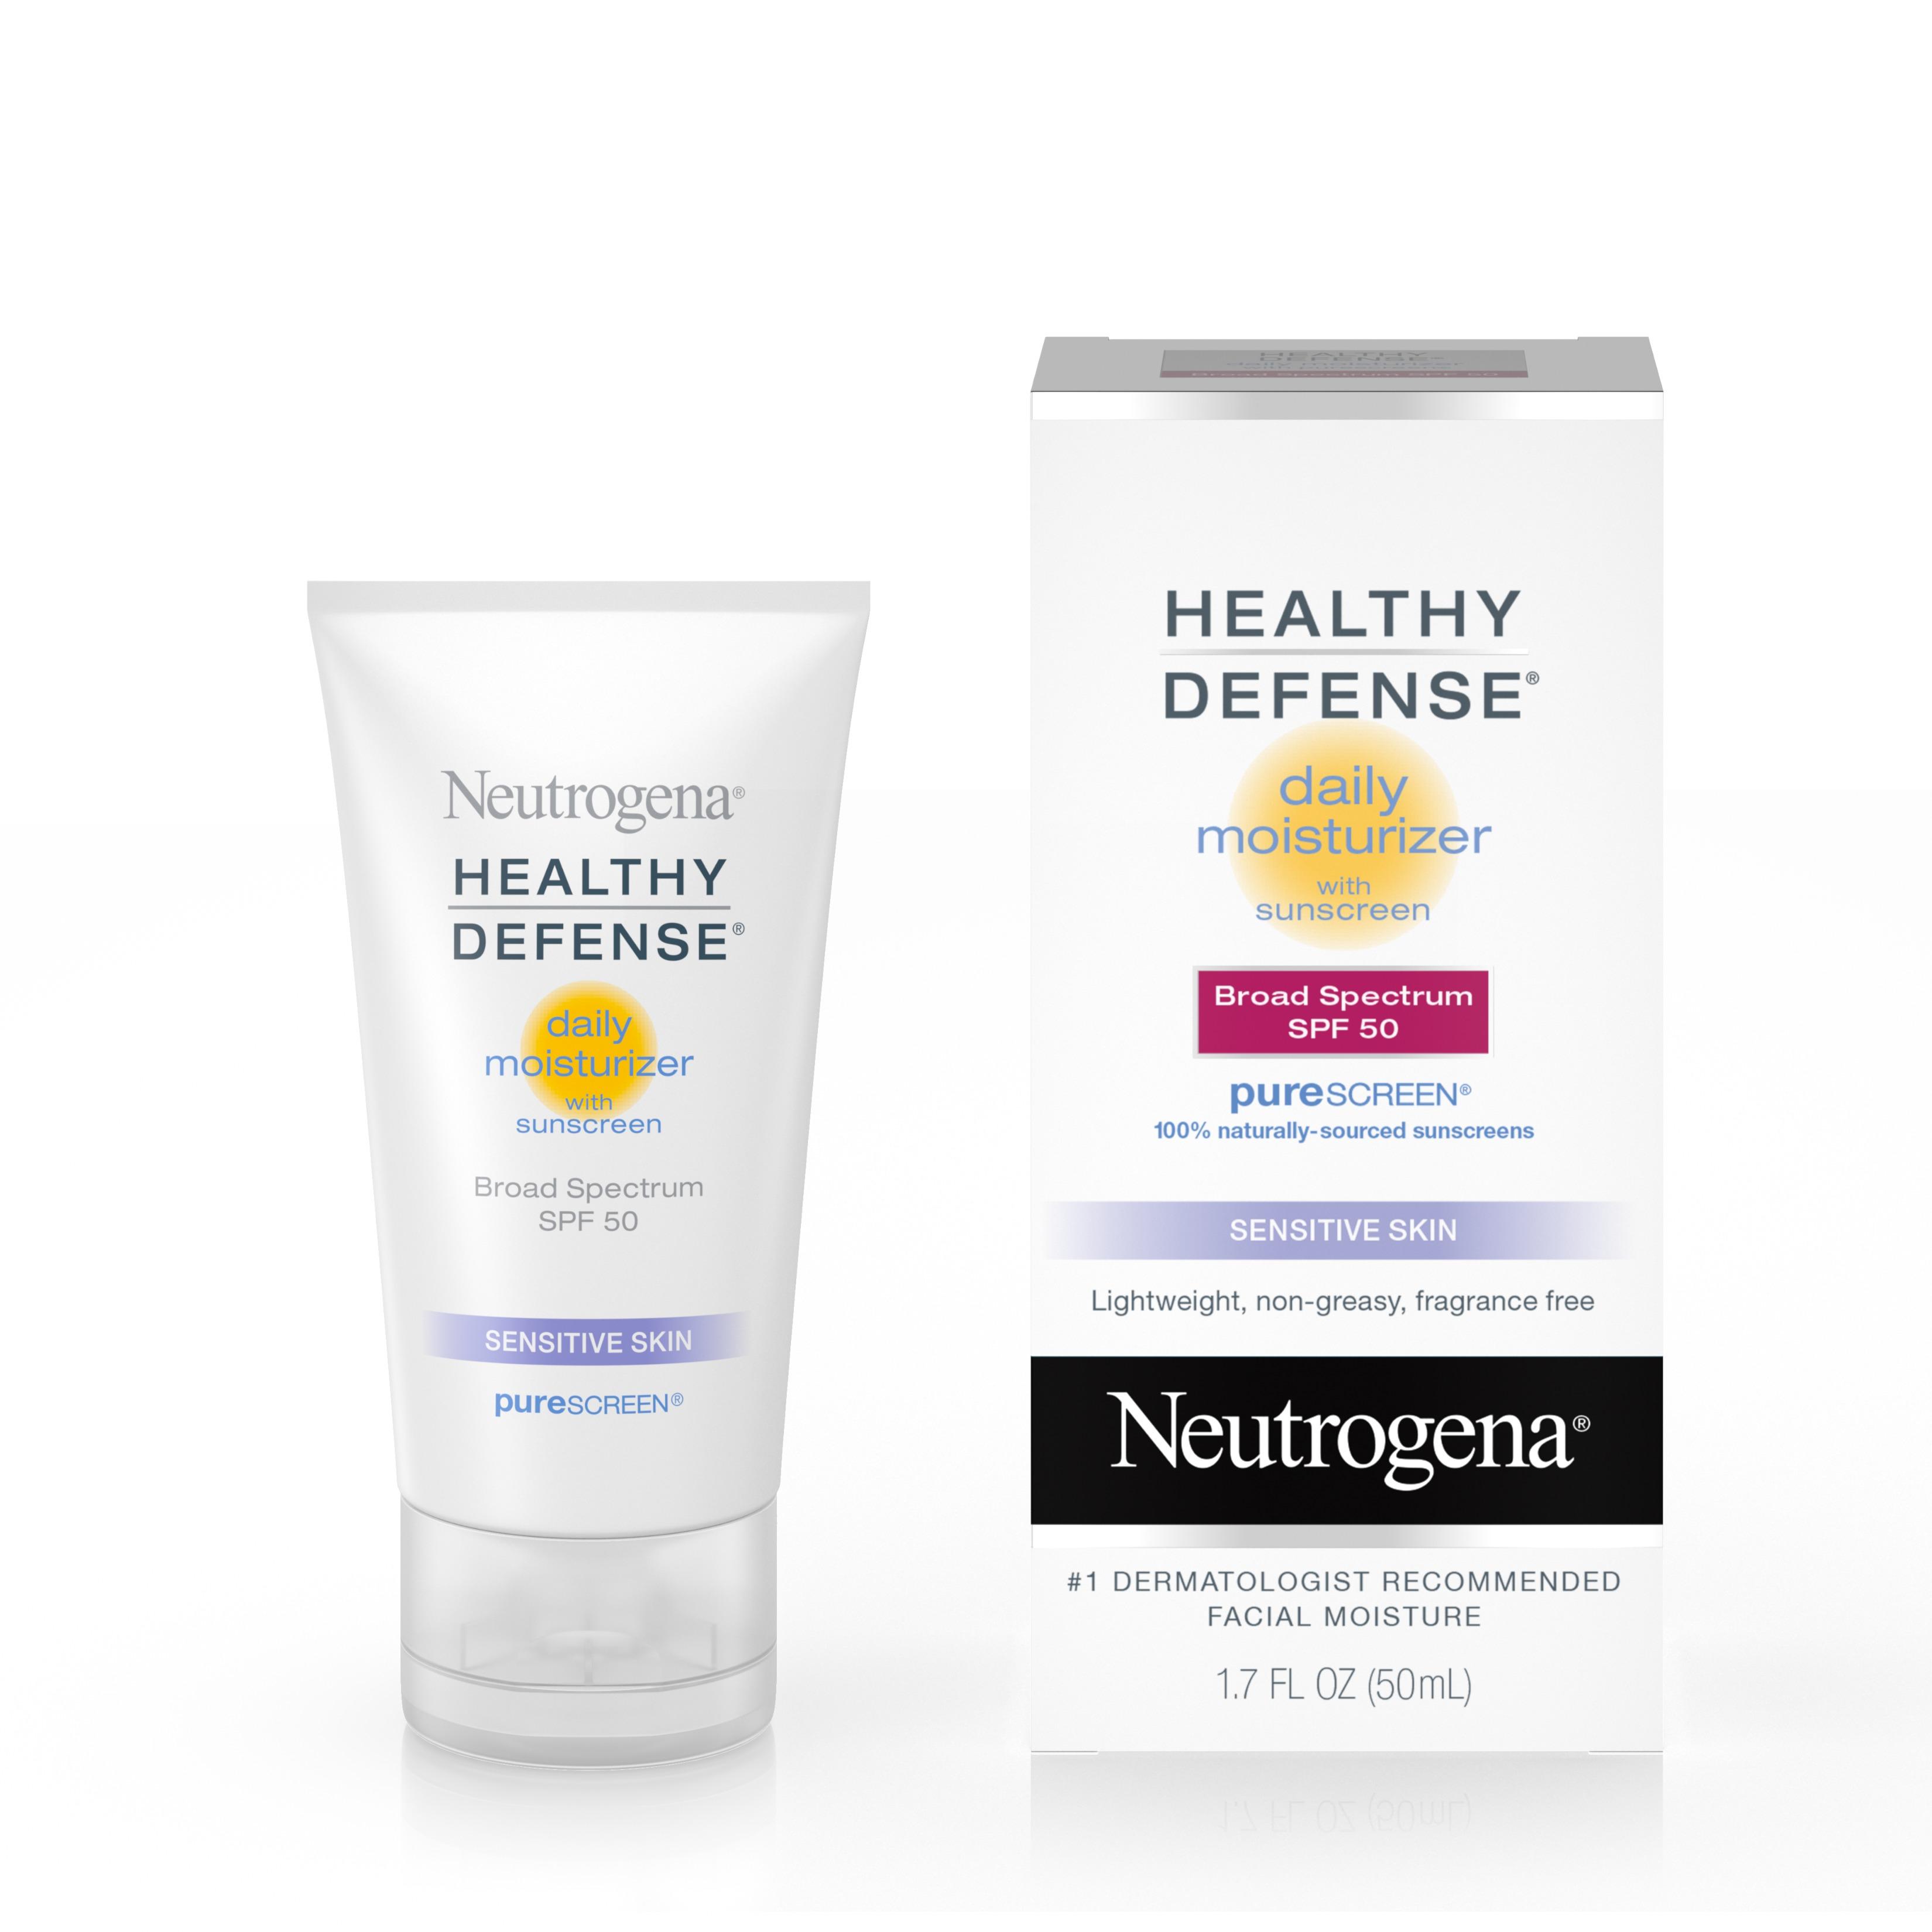 Neutrogena Healthy Defense Sensitive Moisturizer, SPF 50, 1.7 fl. oz